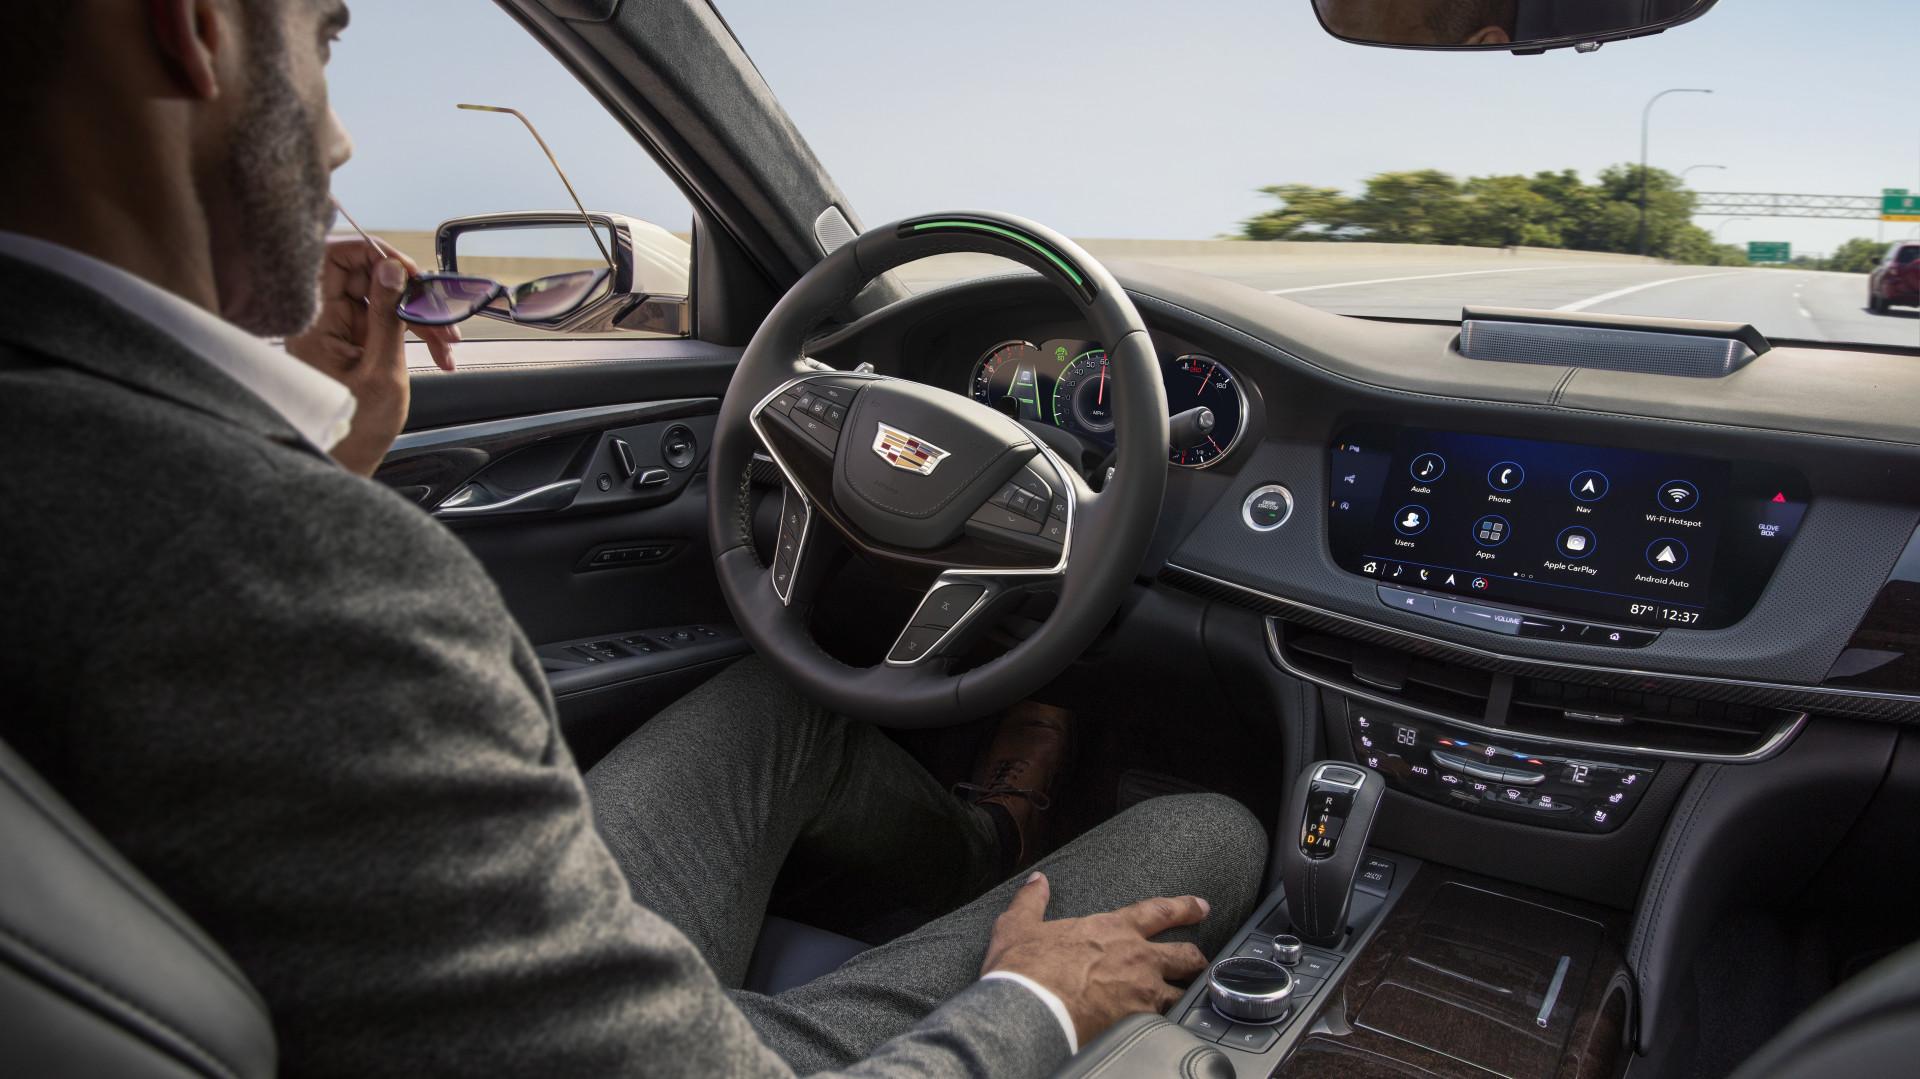 Autonomes Fahren: Softbank investiert zwei Milliarden Euro in GM-Tochter Cruise